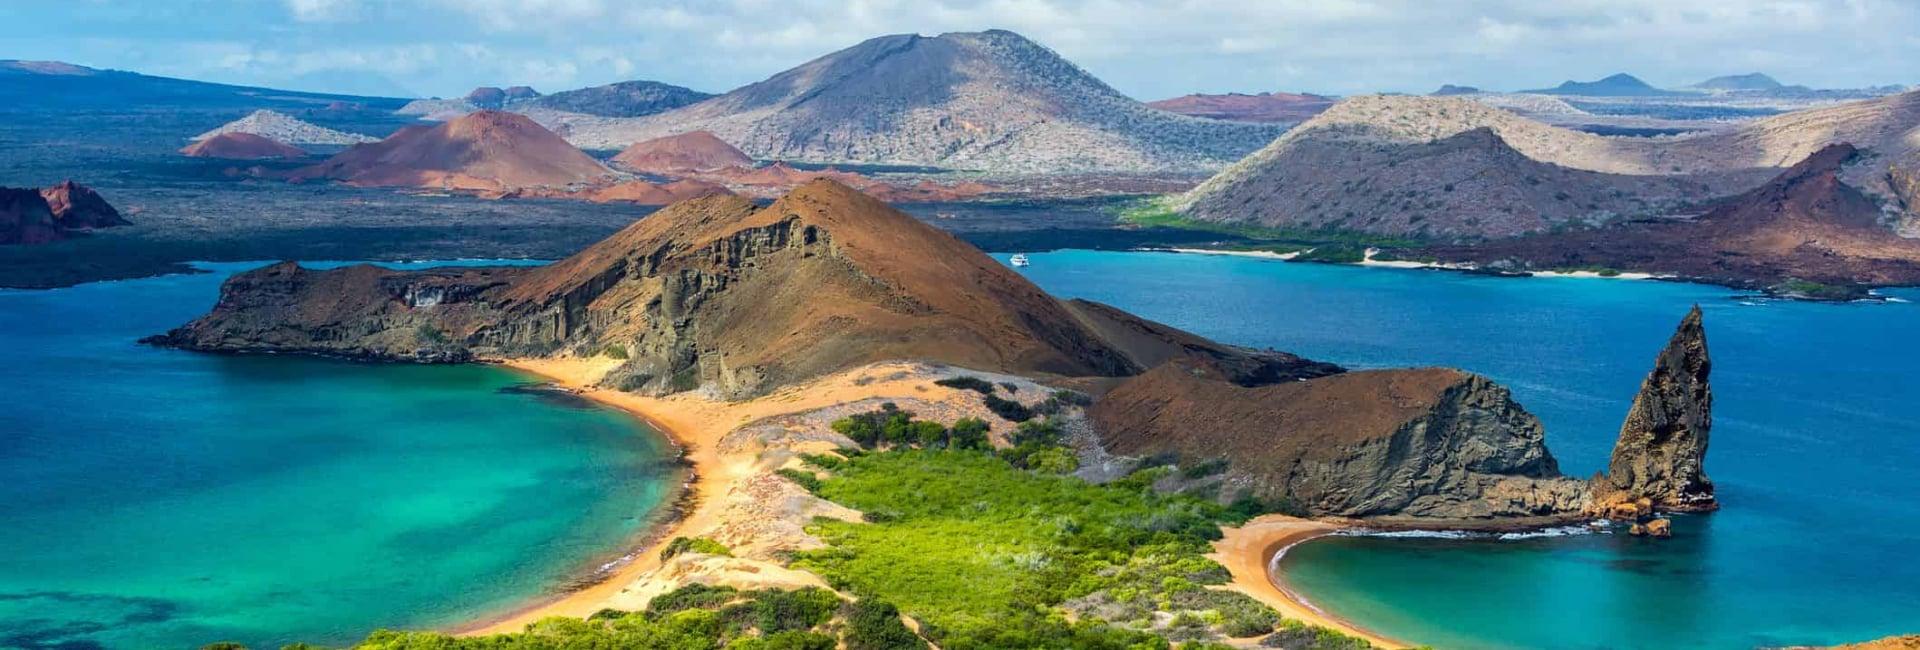 Udsigt over Galapagos